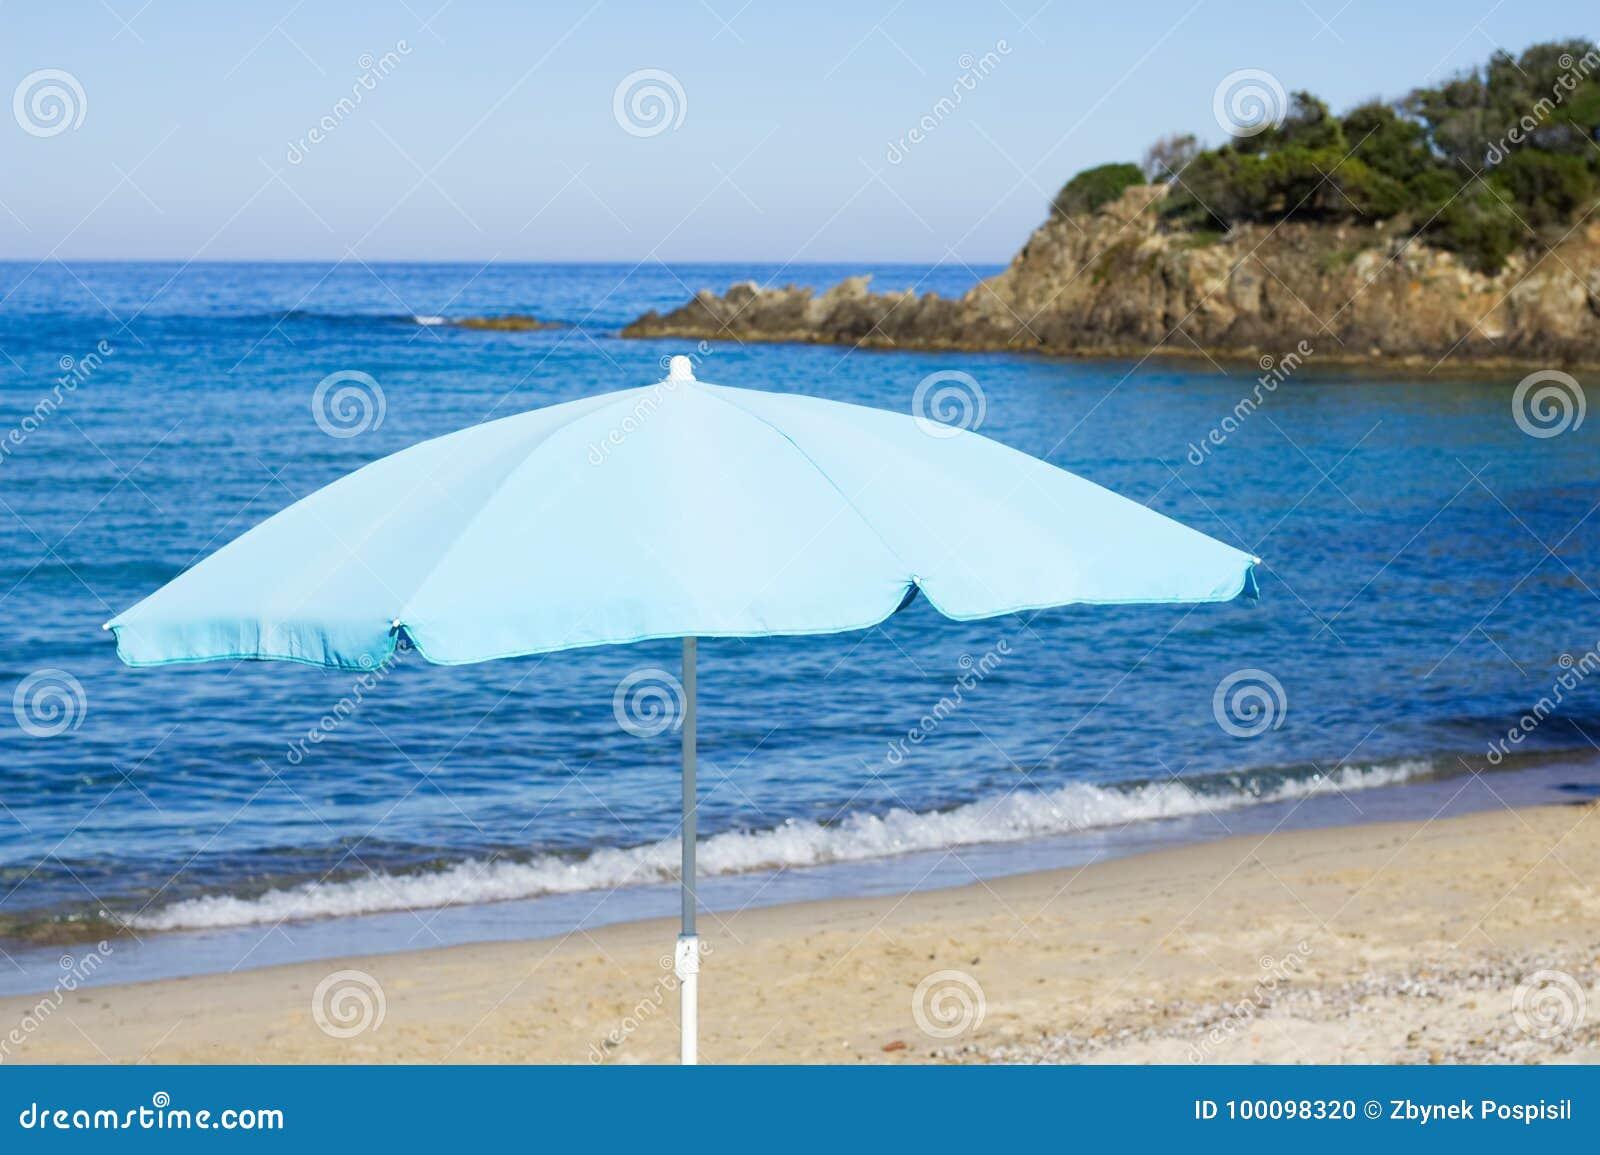 Blue Parasol On Sunny Beach Stock Photo - Image of island 2b21b52490b